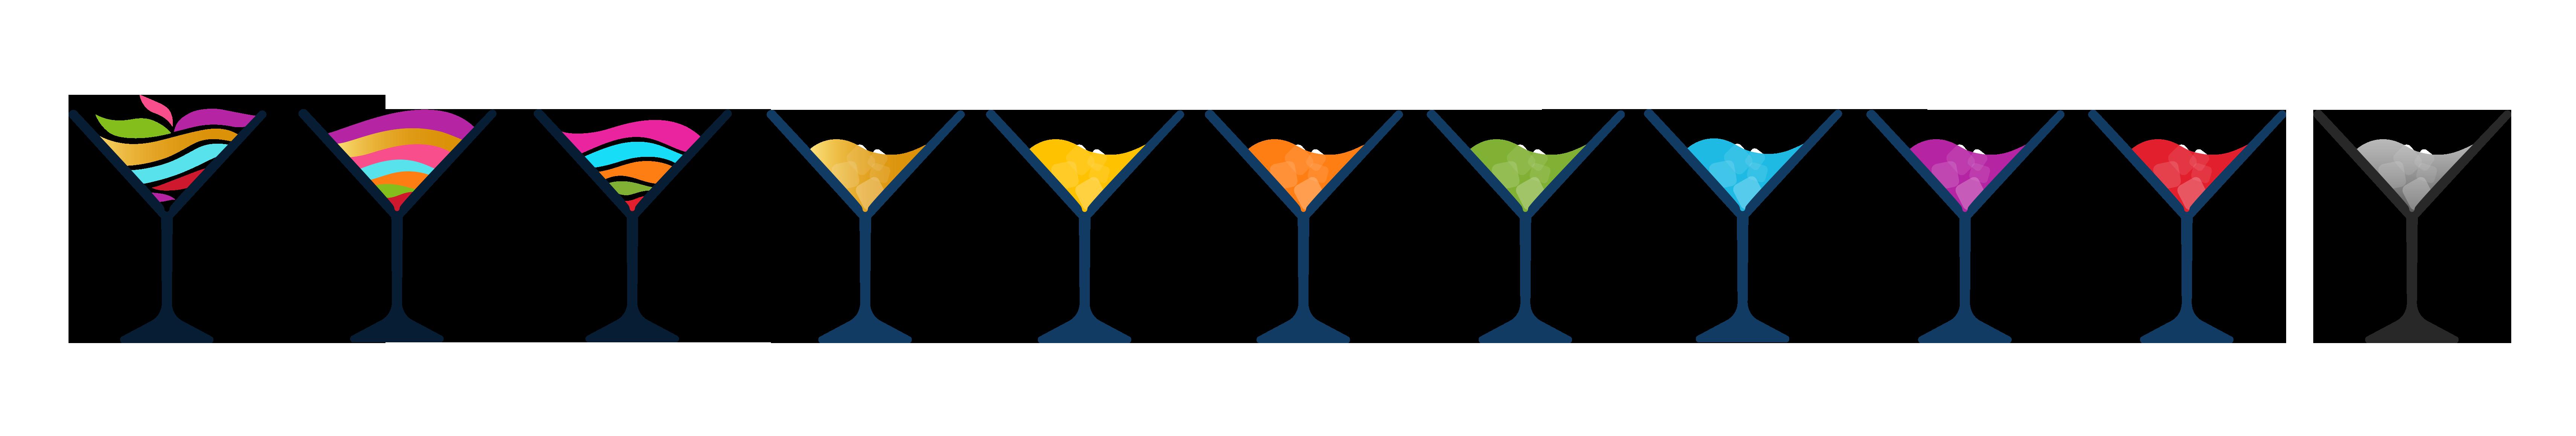 Snowy river cocktail salt. Cocktails clipart margarita glass